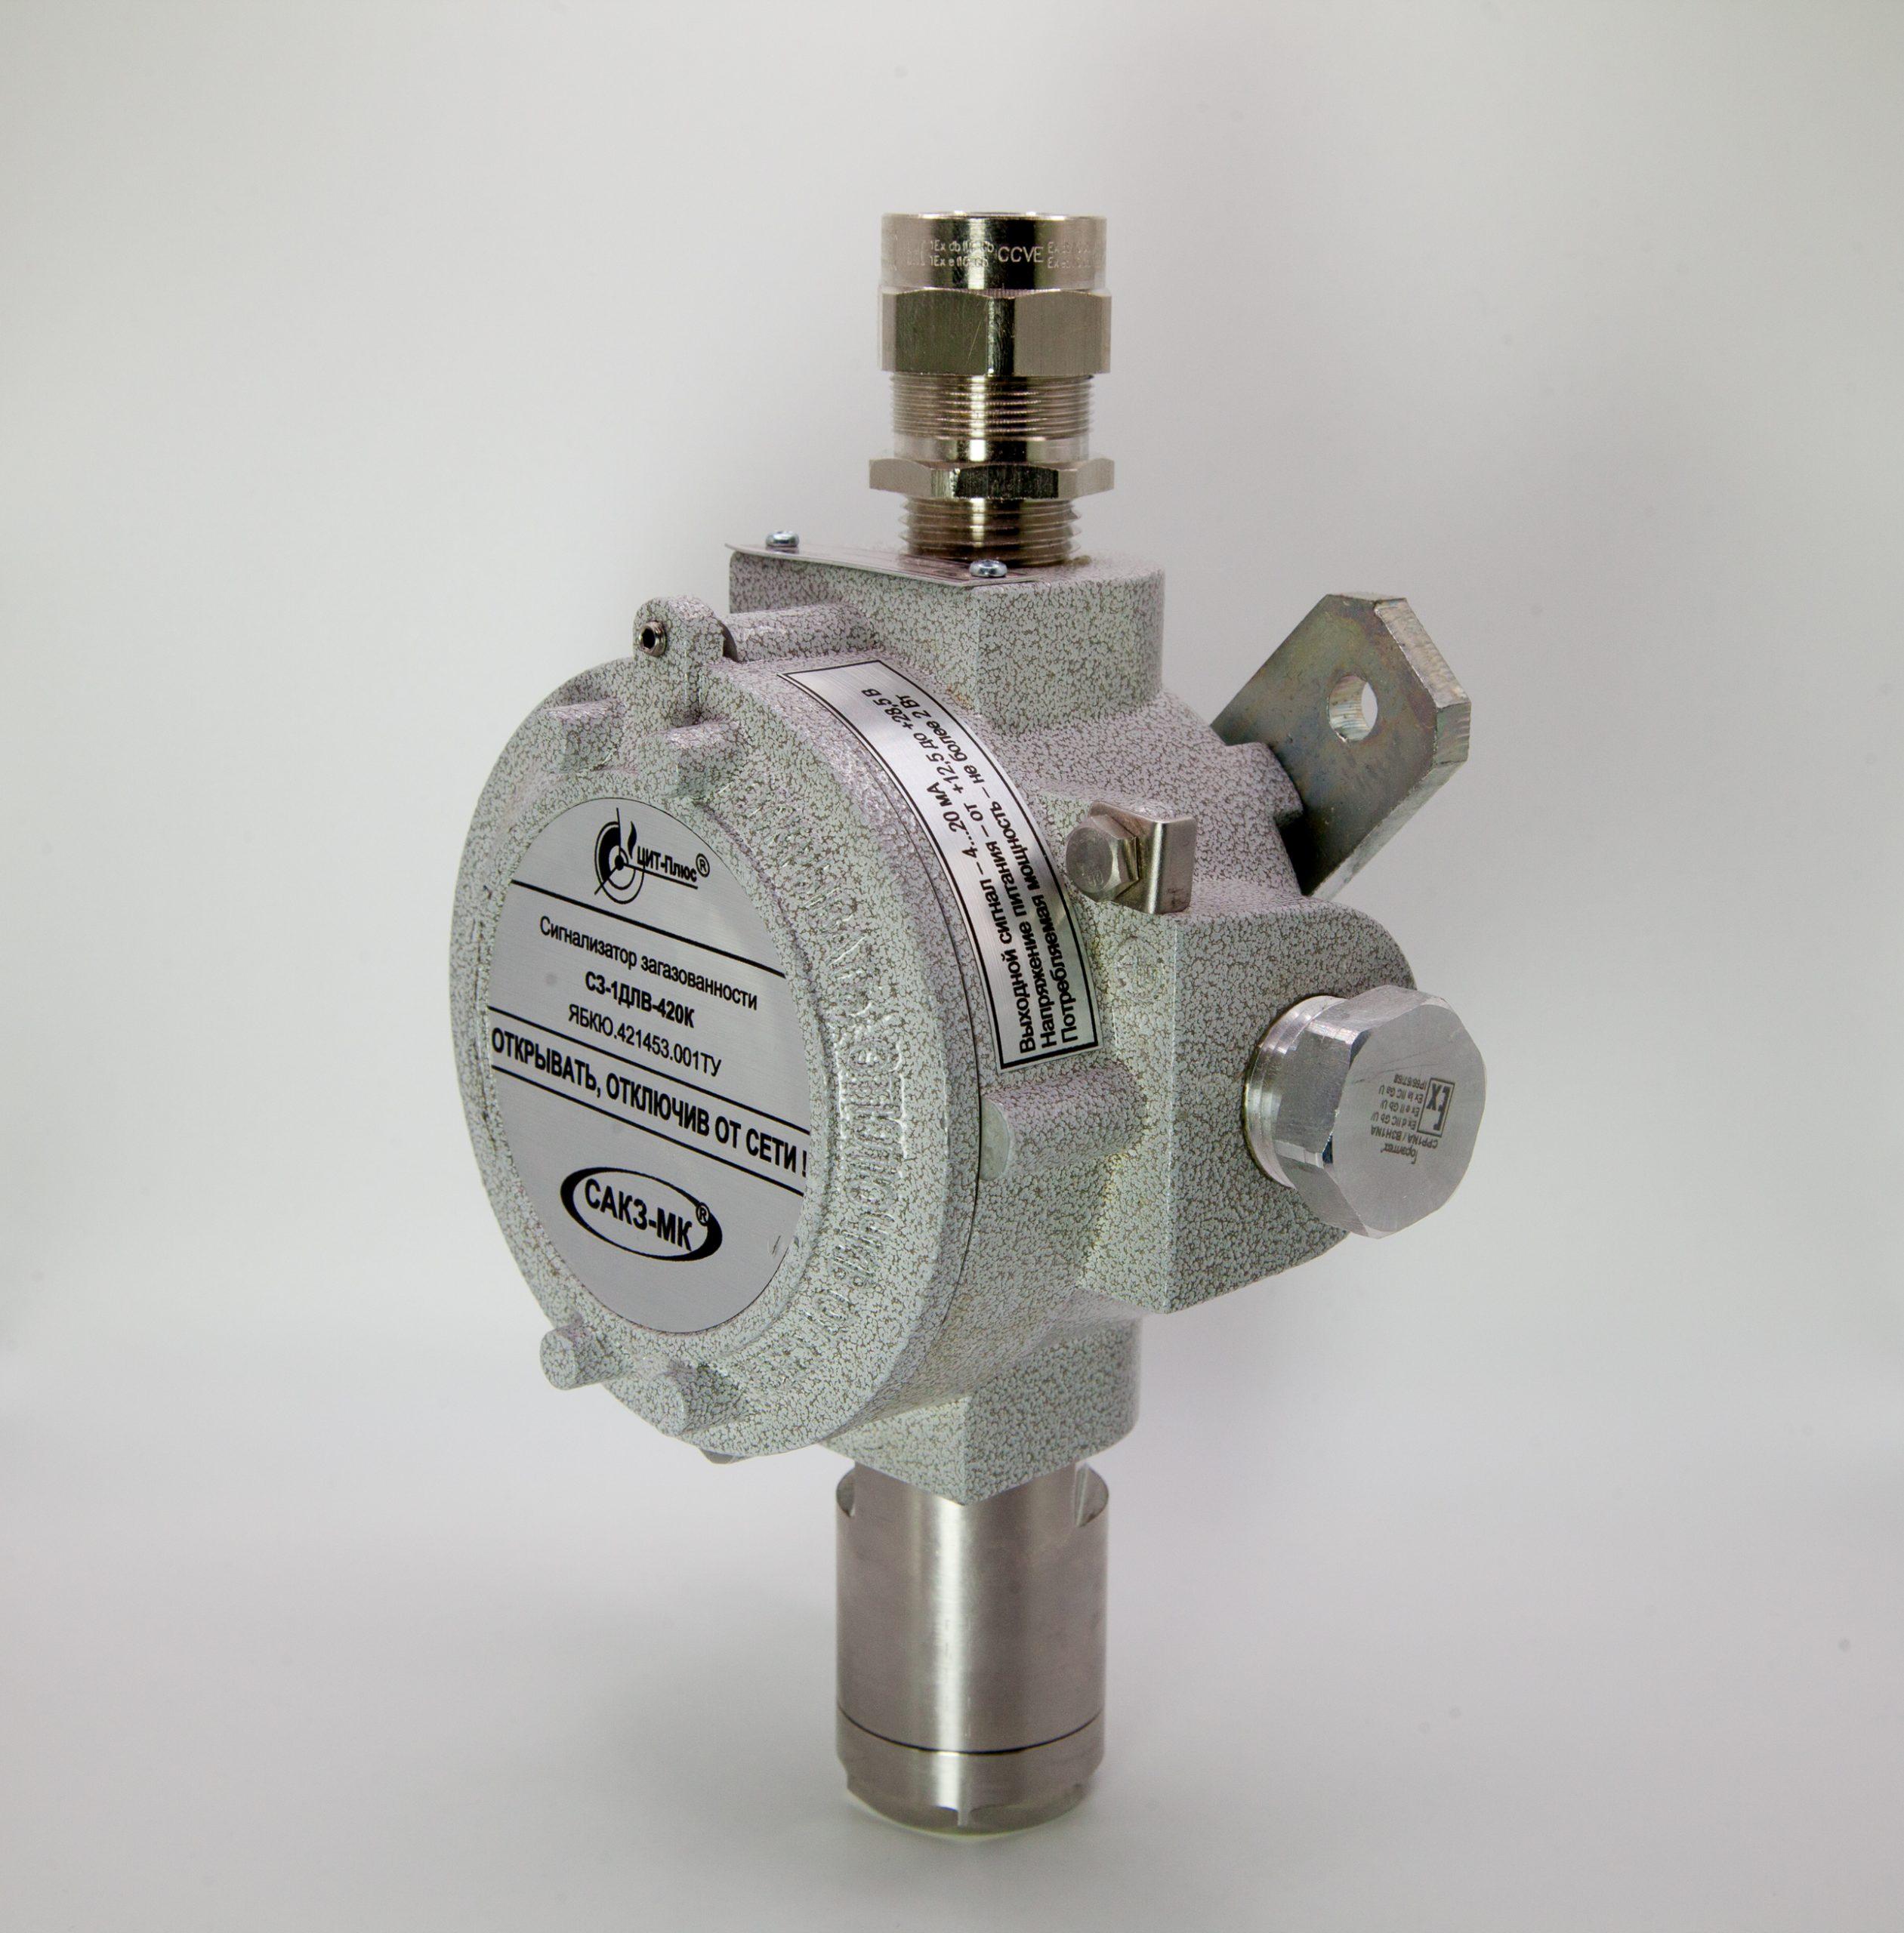 Сигнализатор загазованности СЗ-1ДЛВ-420К